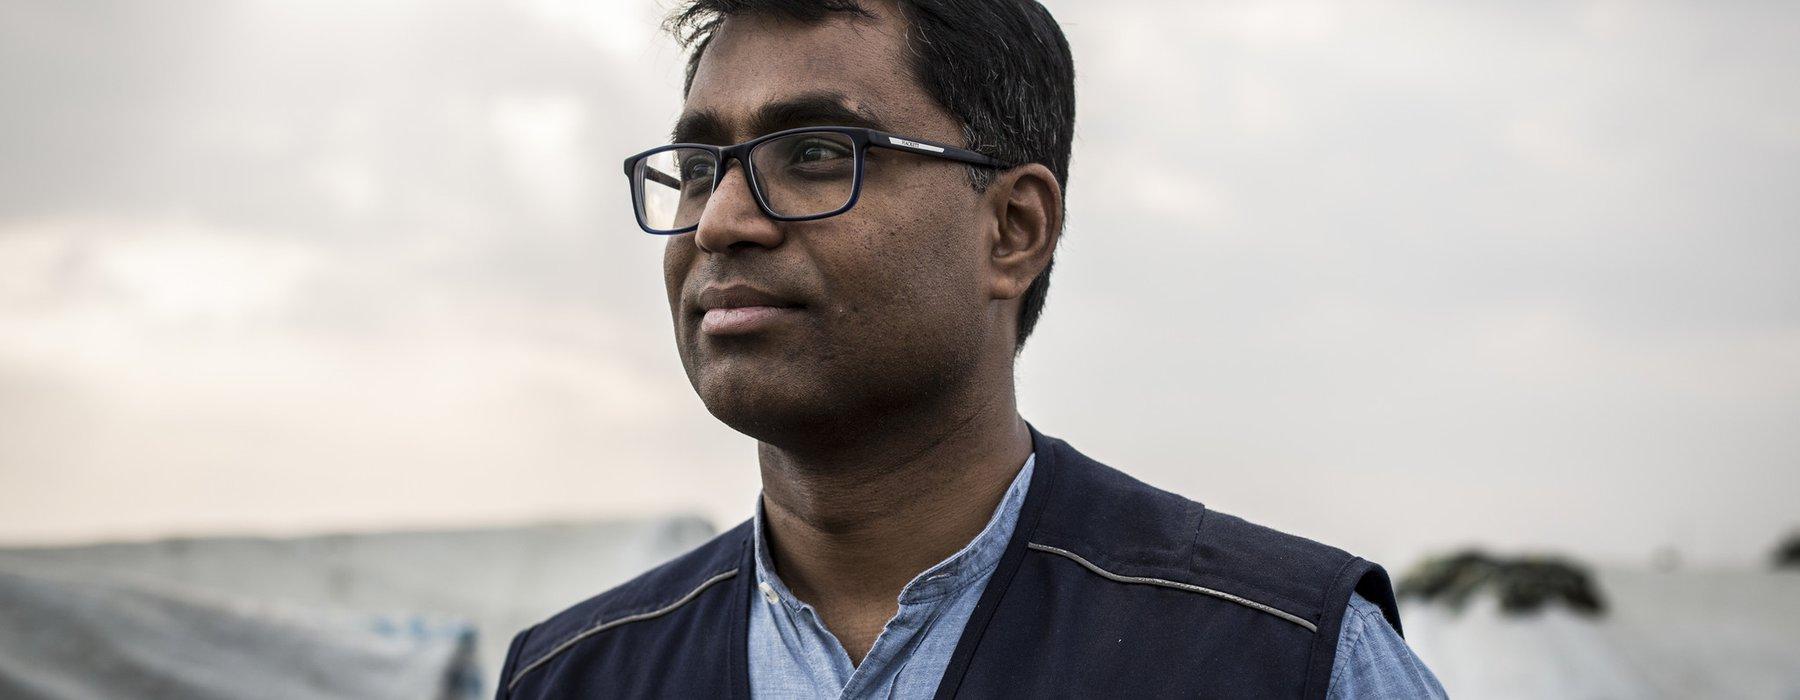 A portrait of Dhananjayan Sriskandarajah wearing a black Oxfam vest.